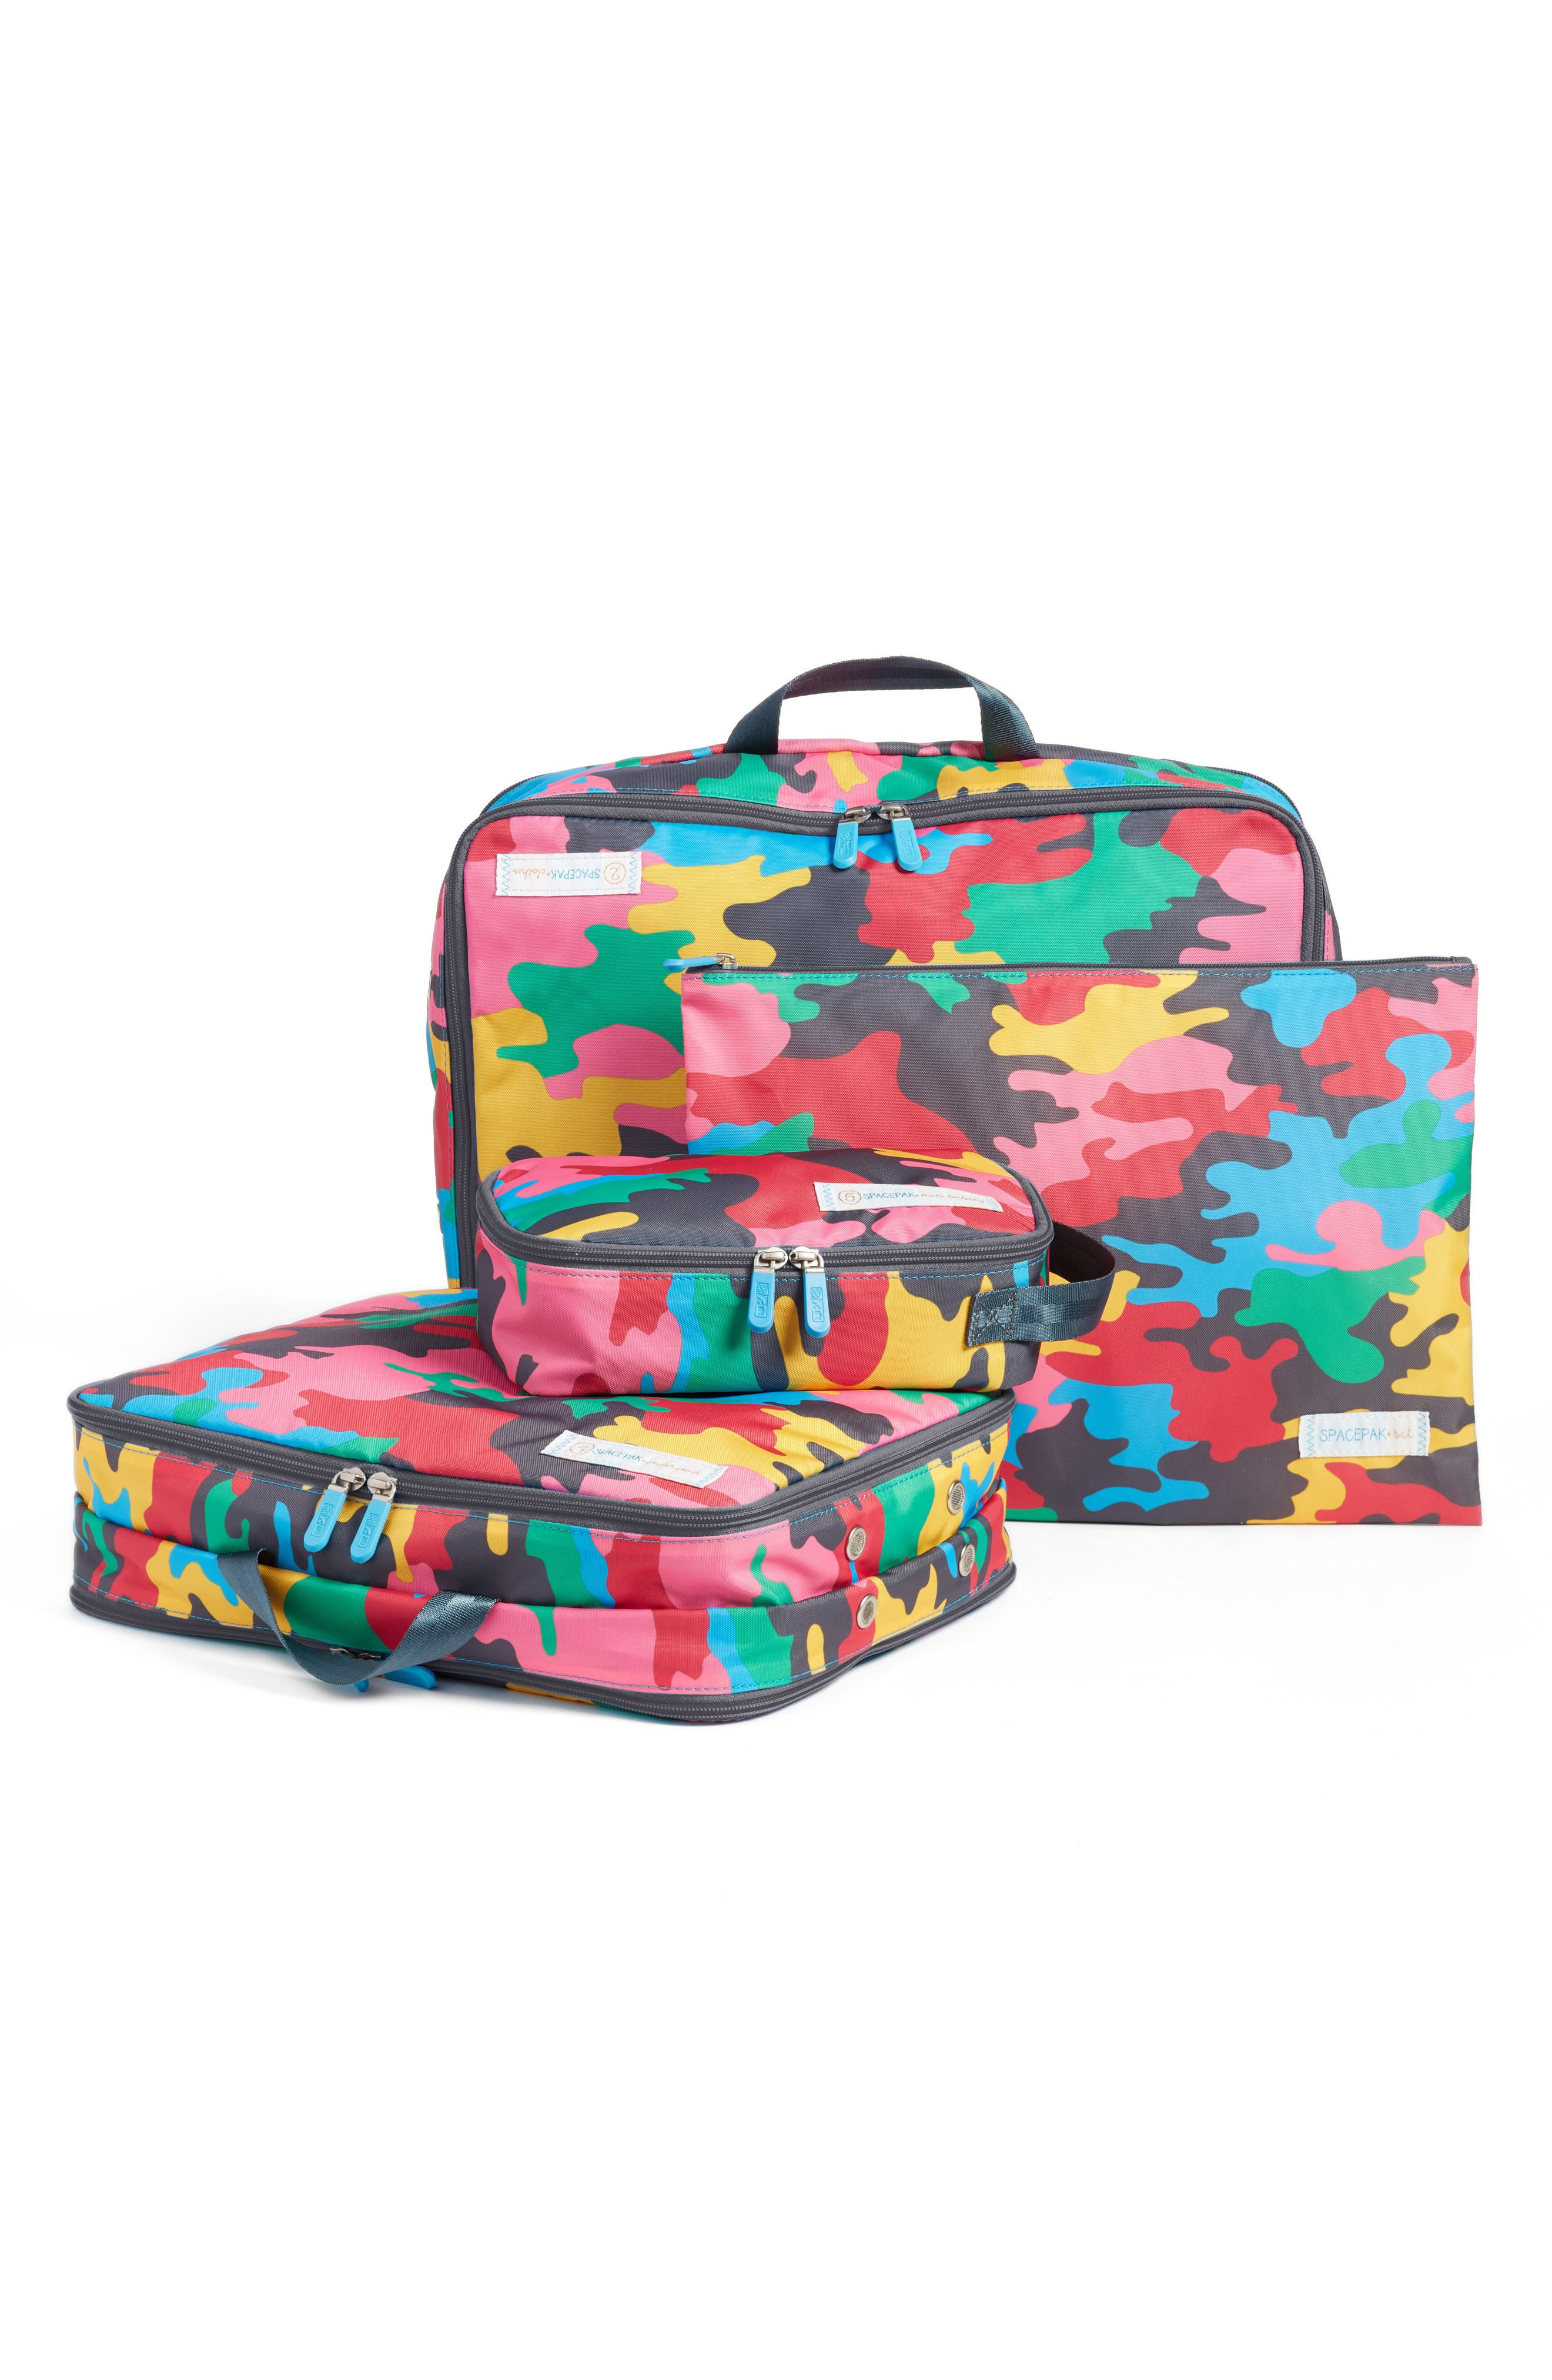 Main Image - Flight 001 Spacepak Packing Compression Bag Set